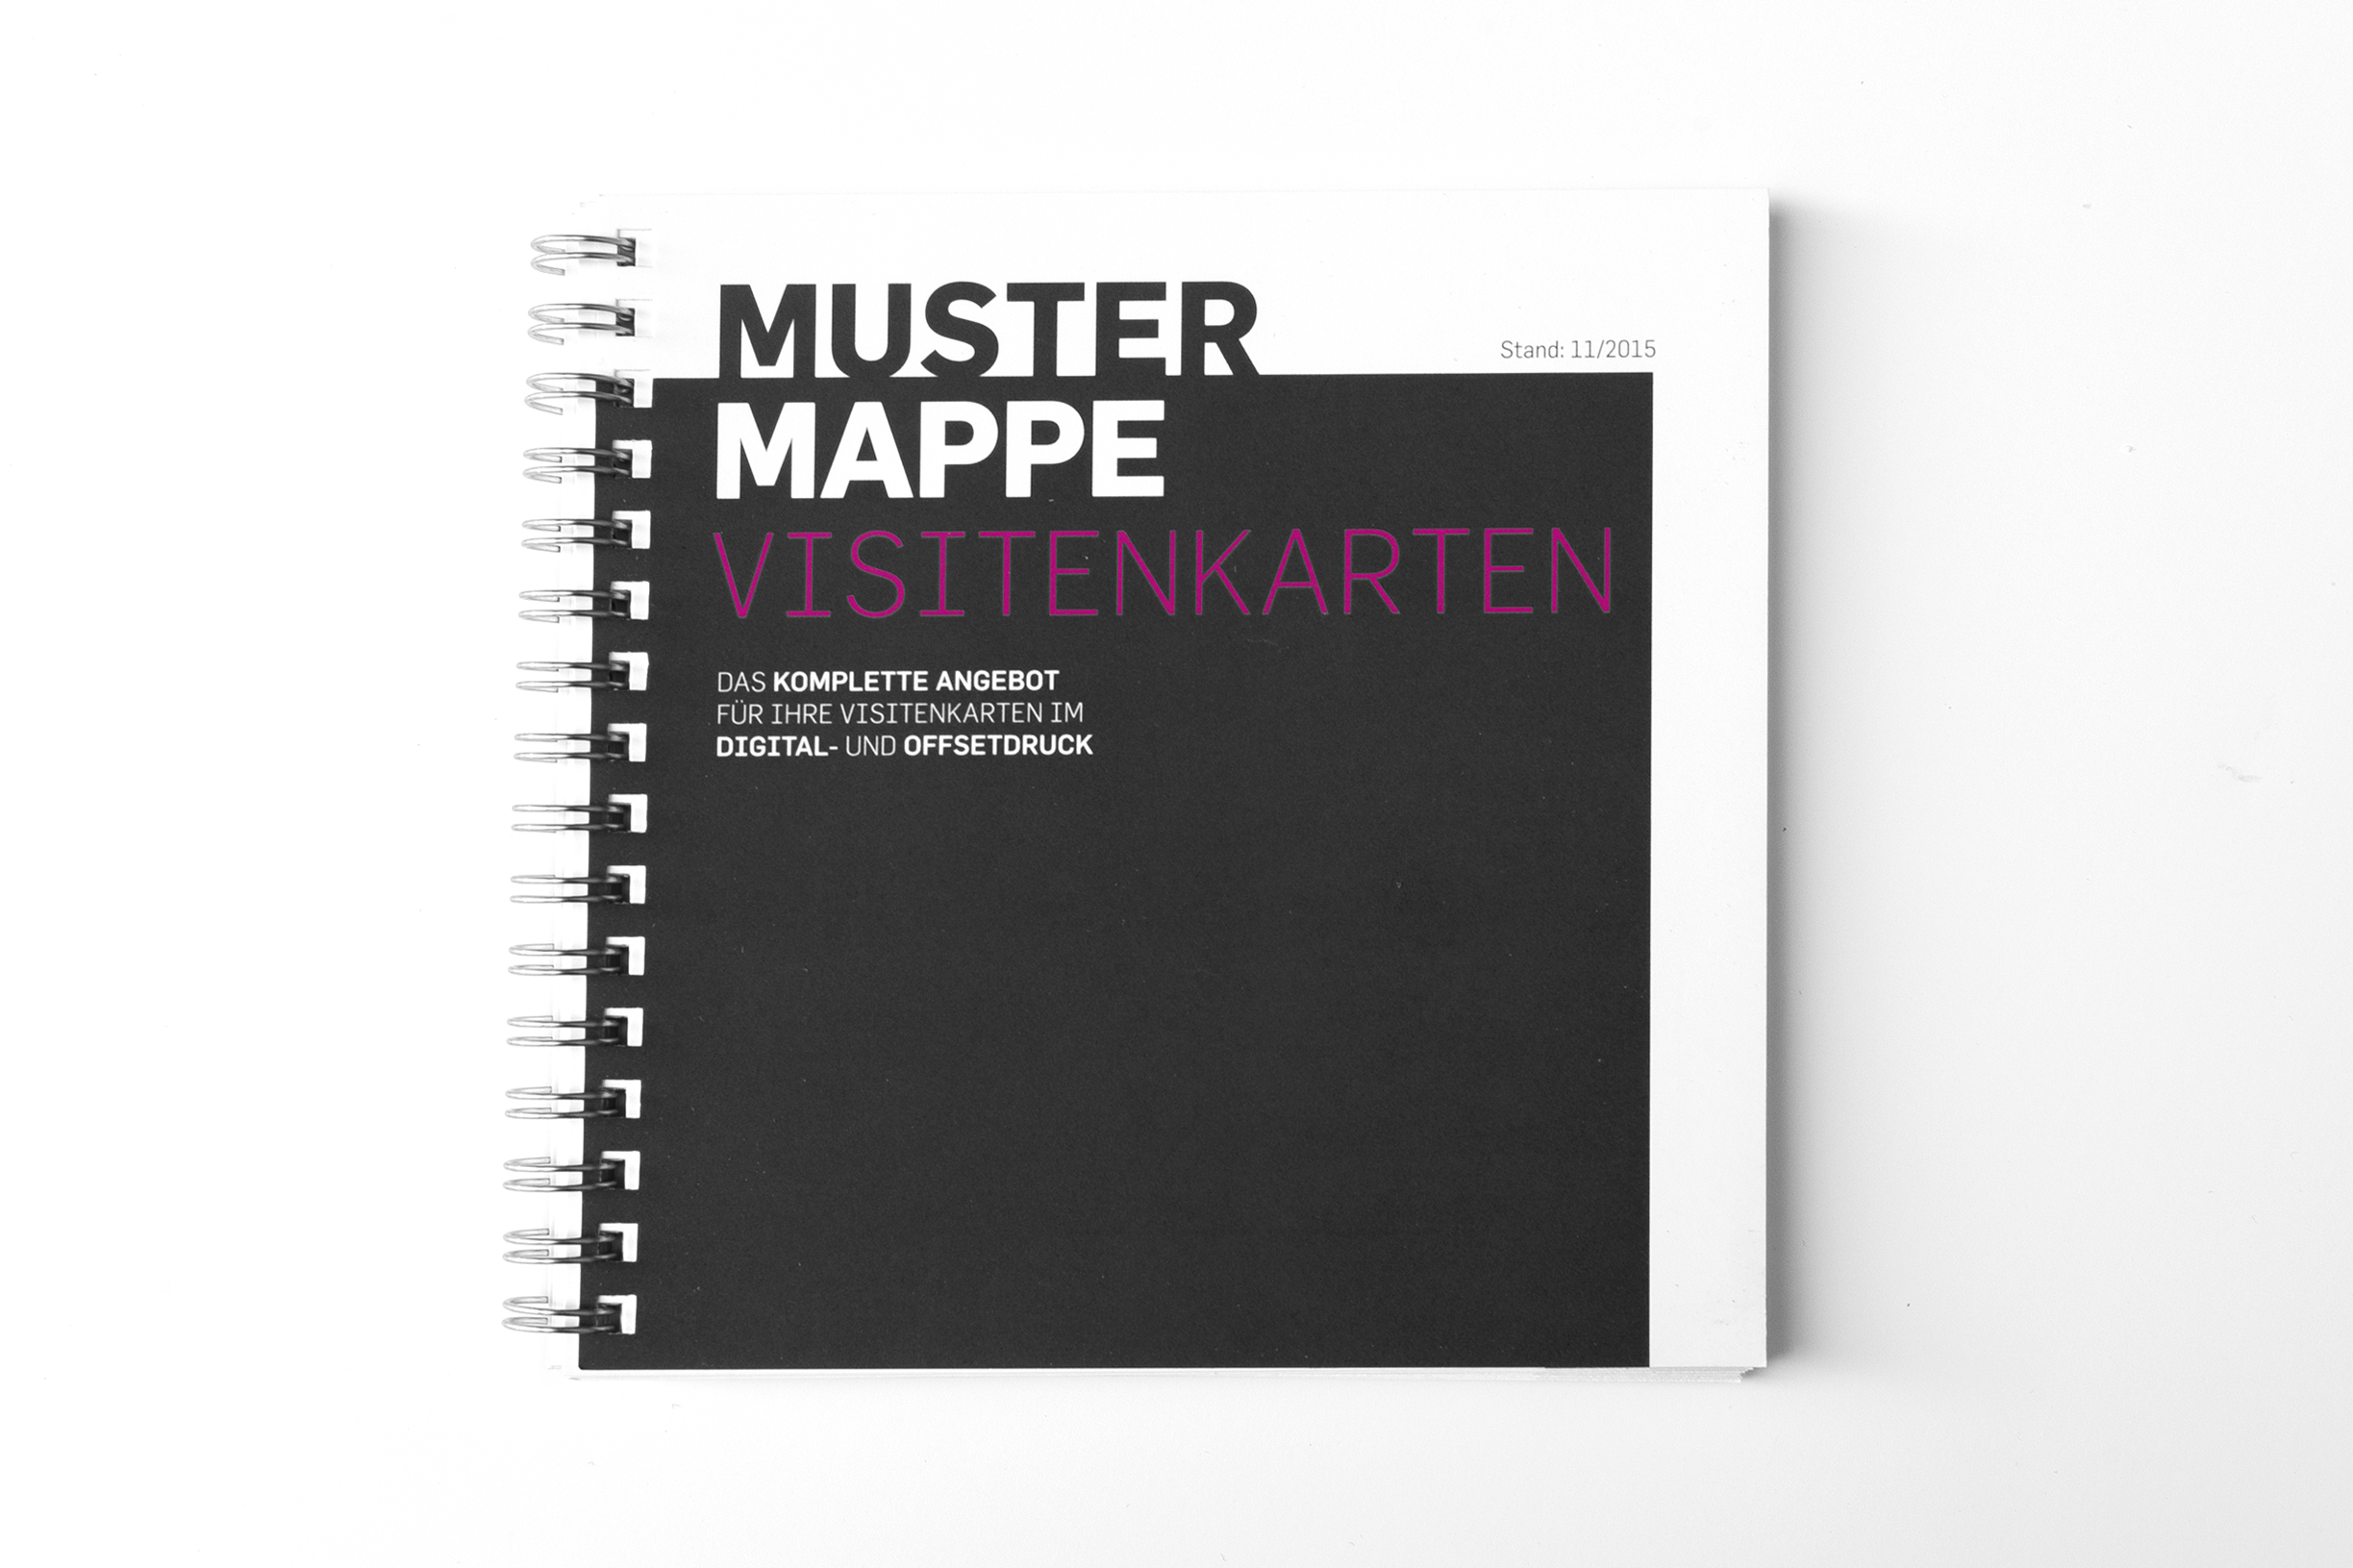 muster offset visitenkarten - Muster Visitenkarten